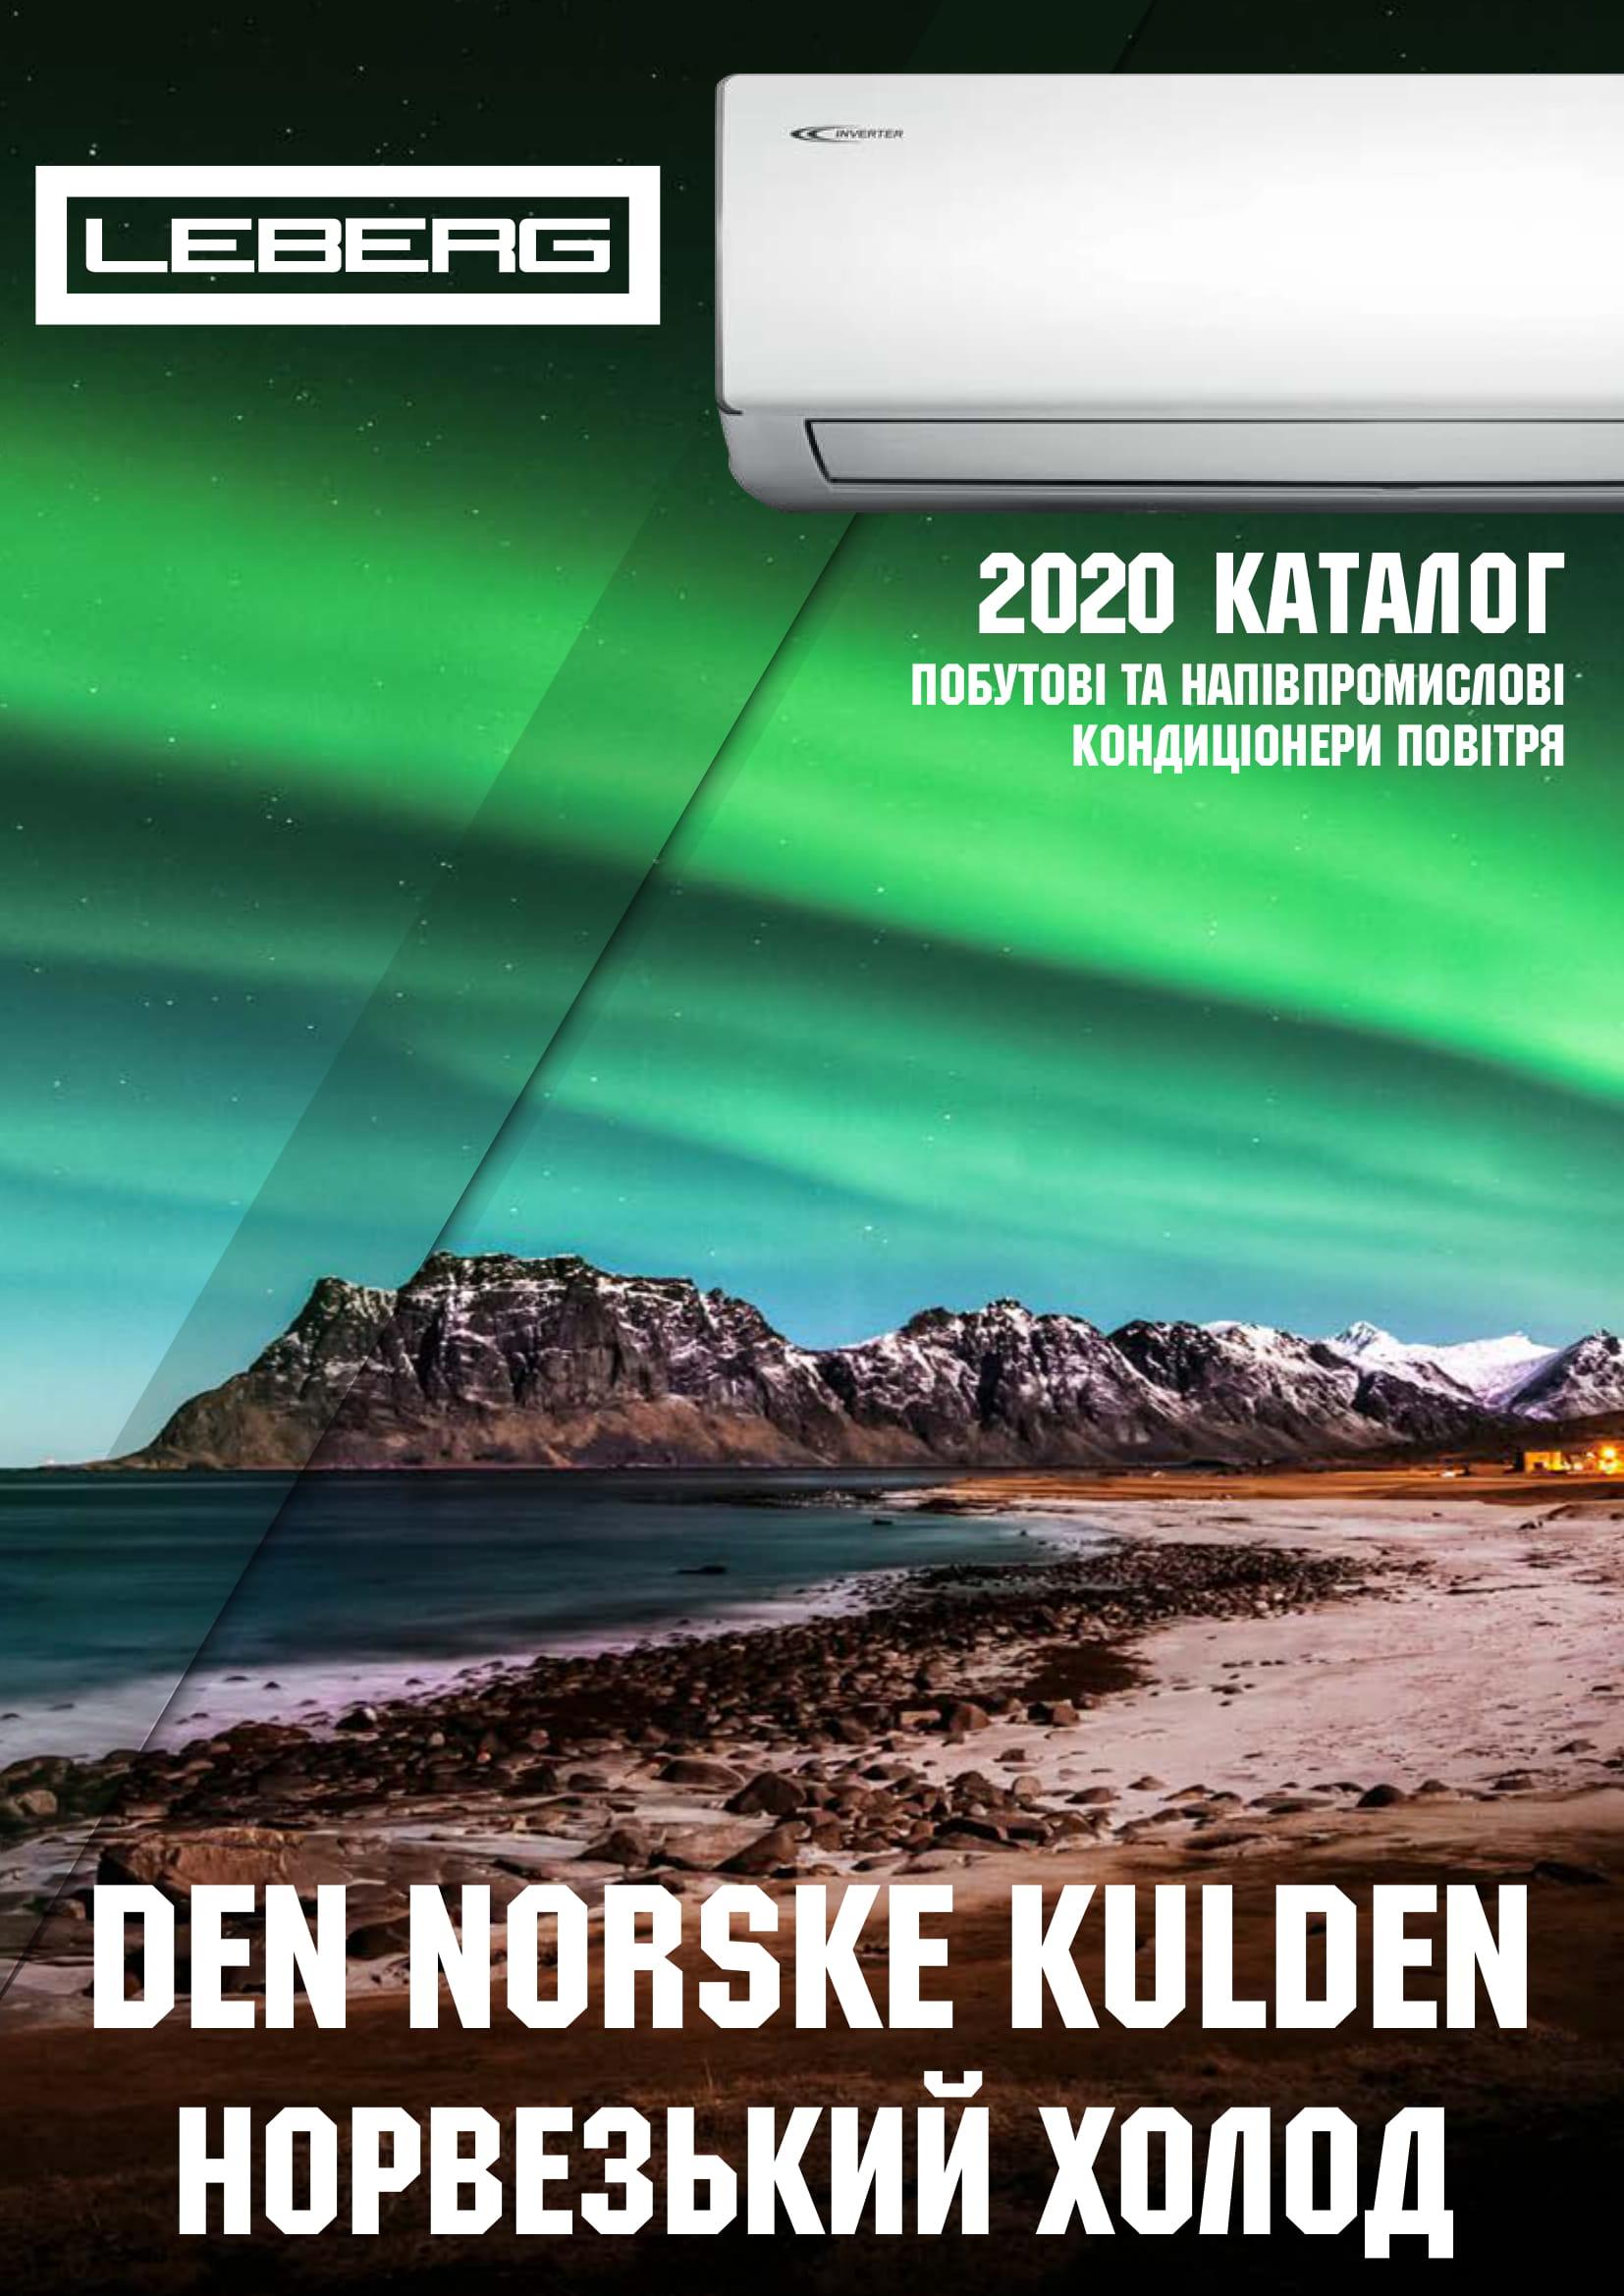 Каталог кондиционеров Leberg 2020